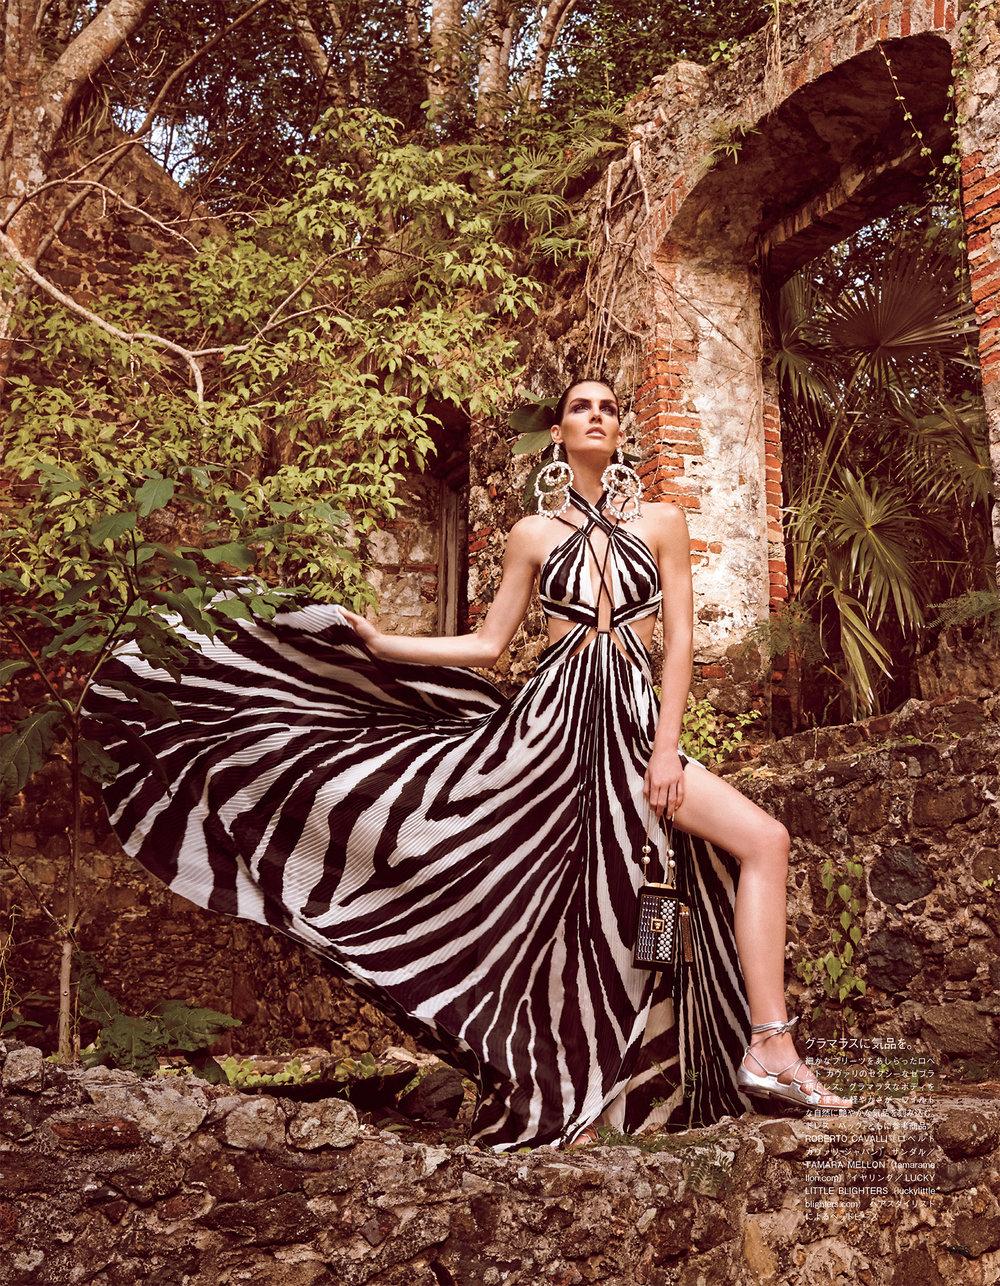 Giovanna-Battaglia-Vogue-Japan-Mariano-Vivanco-Forbidden-Paradise-8.jpg